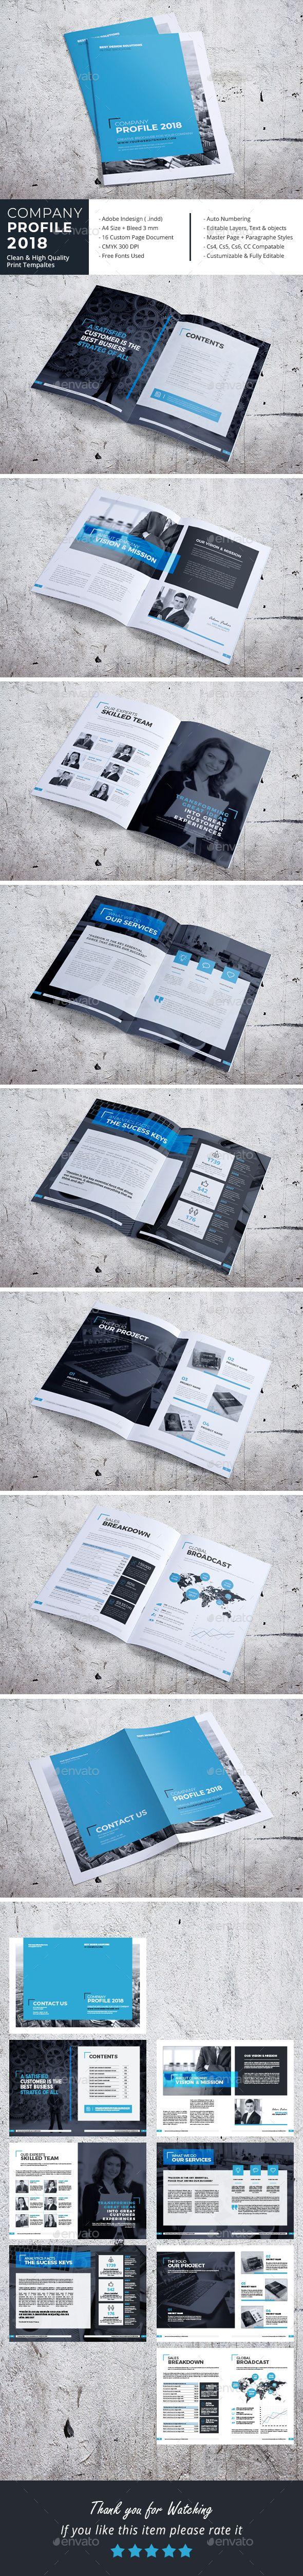 #Company #Profile 2018 - Corporate #Brochures